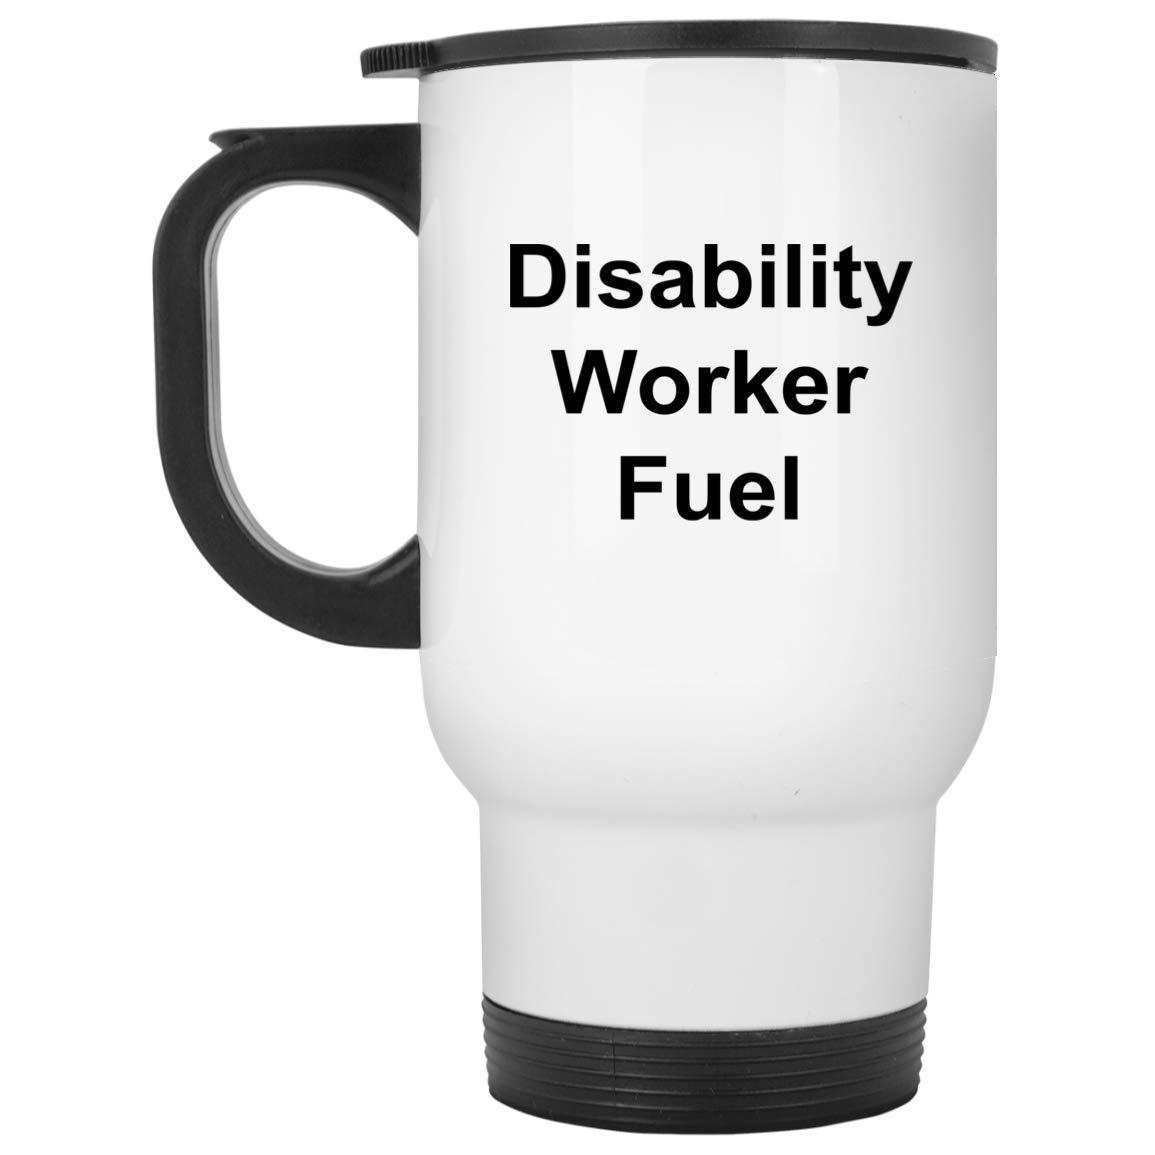 Disability Worker トラベルマグ - 14オンス ホワイトステンレススチール - おもしろノベルティギフトアイデア   B07HPGYLJJ